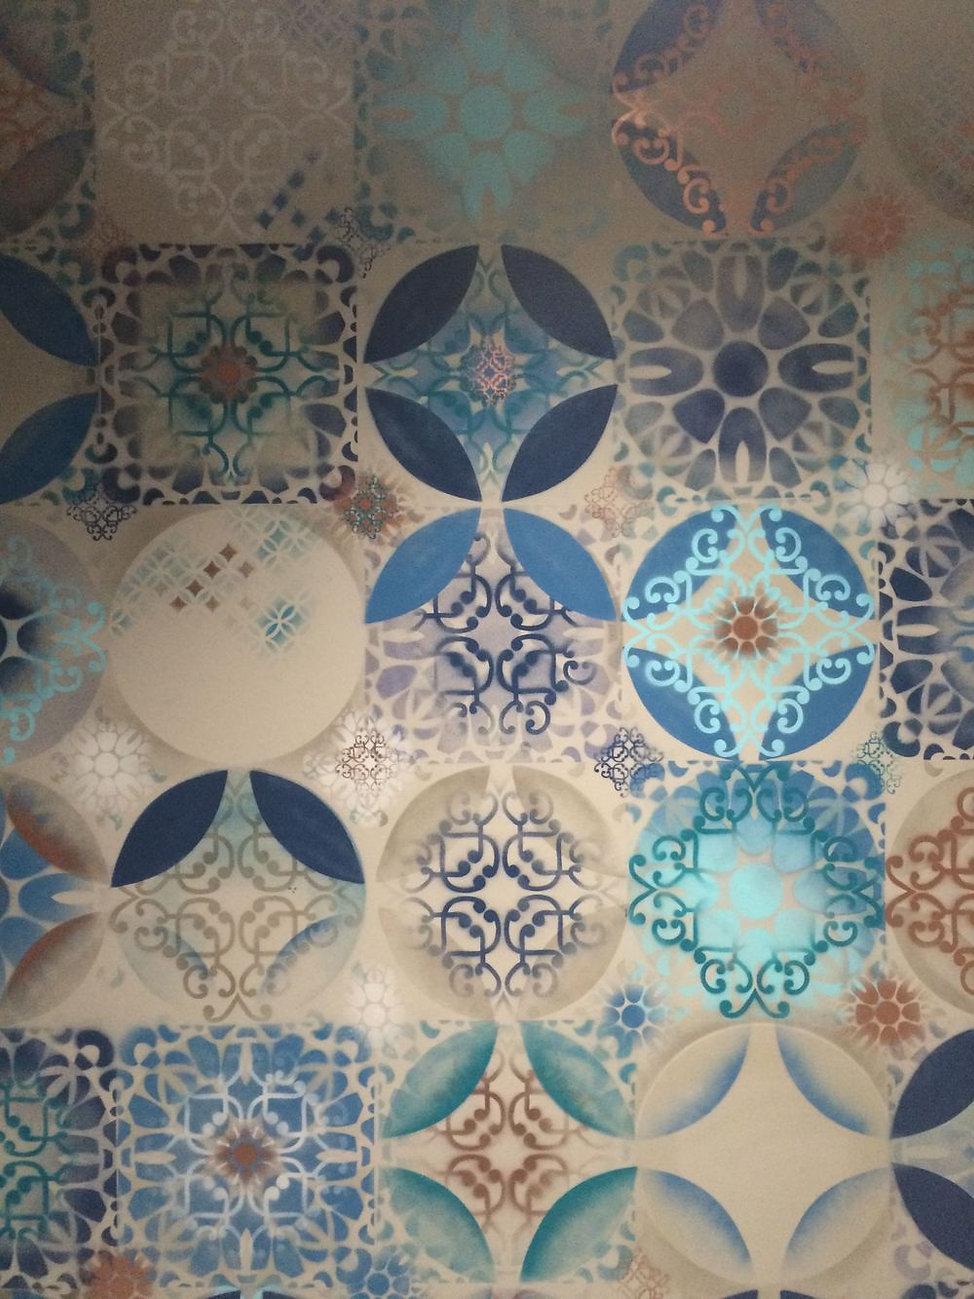 WakudaStudios_Murals_Tiles_4_CommercialD